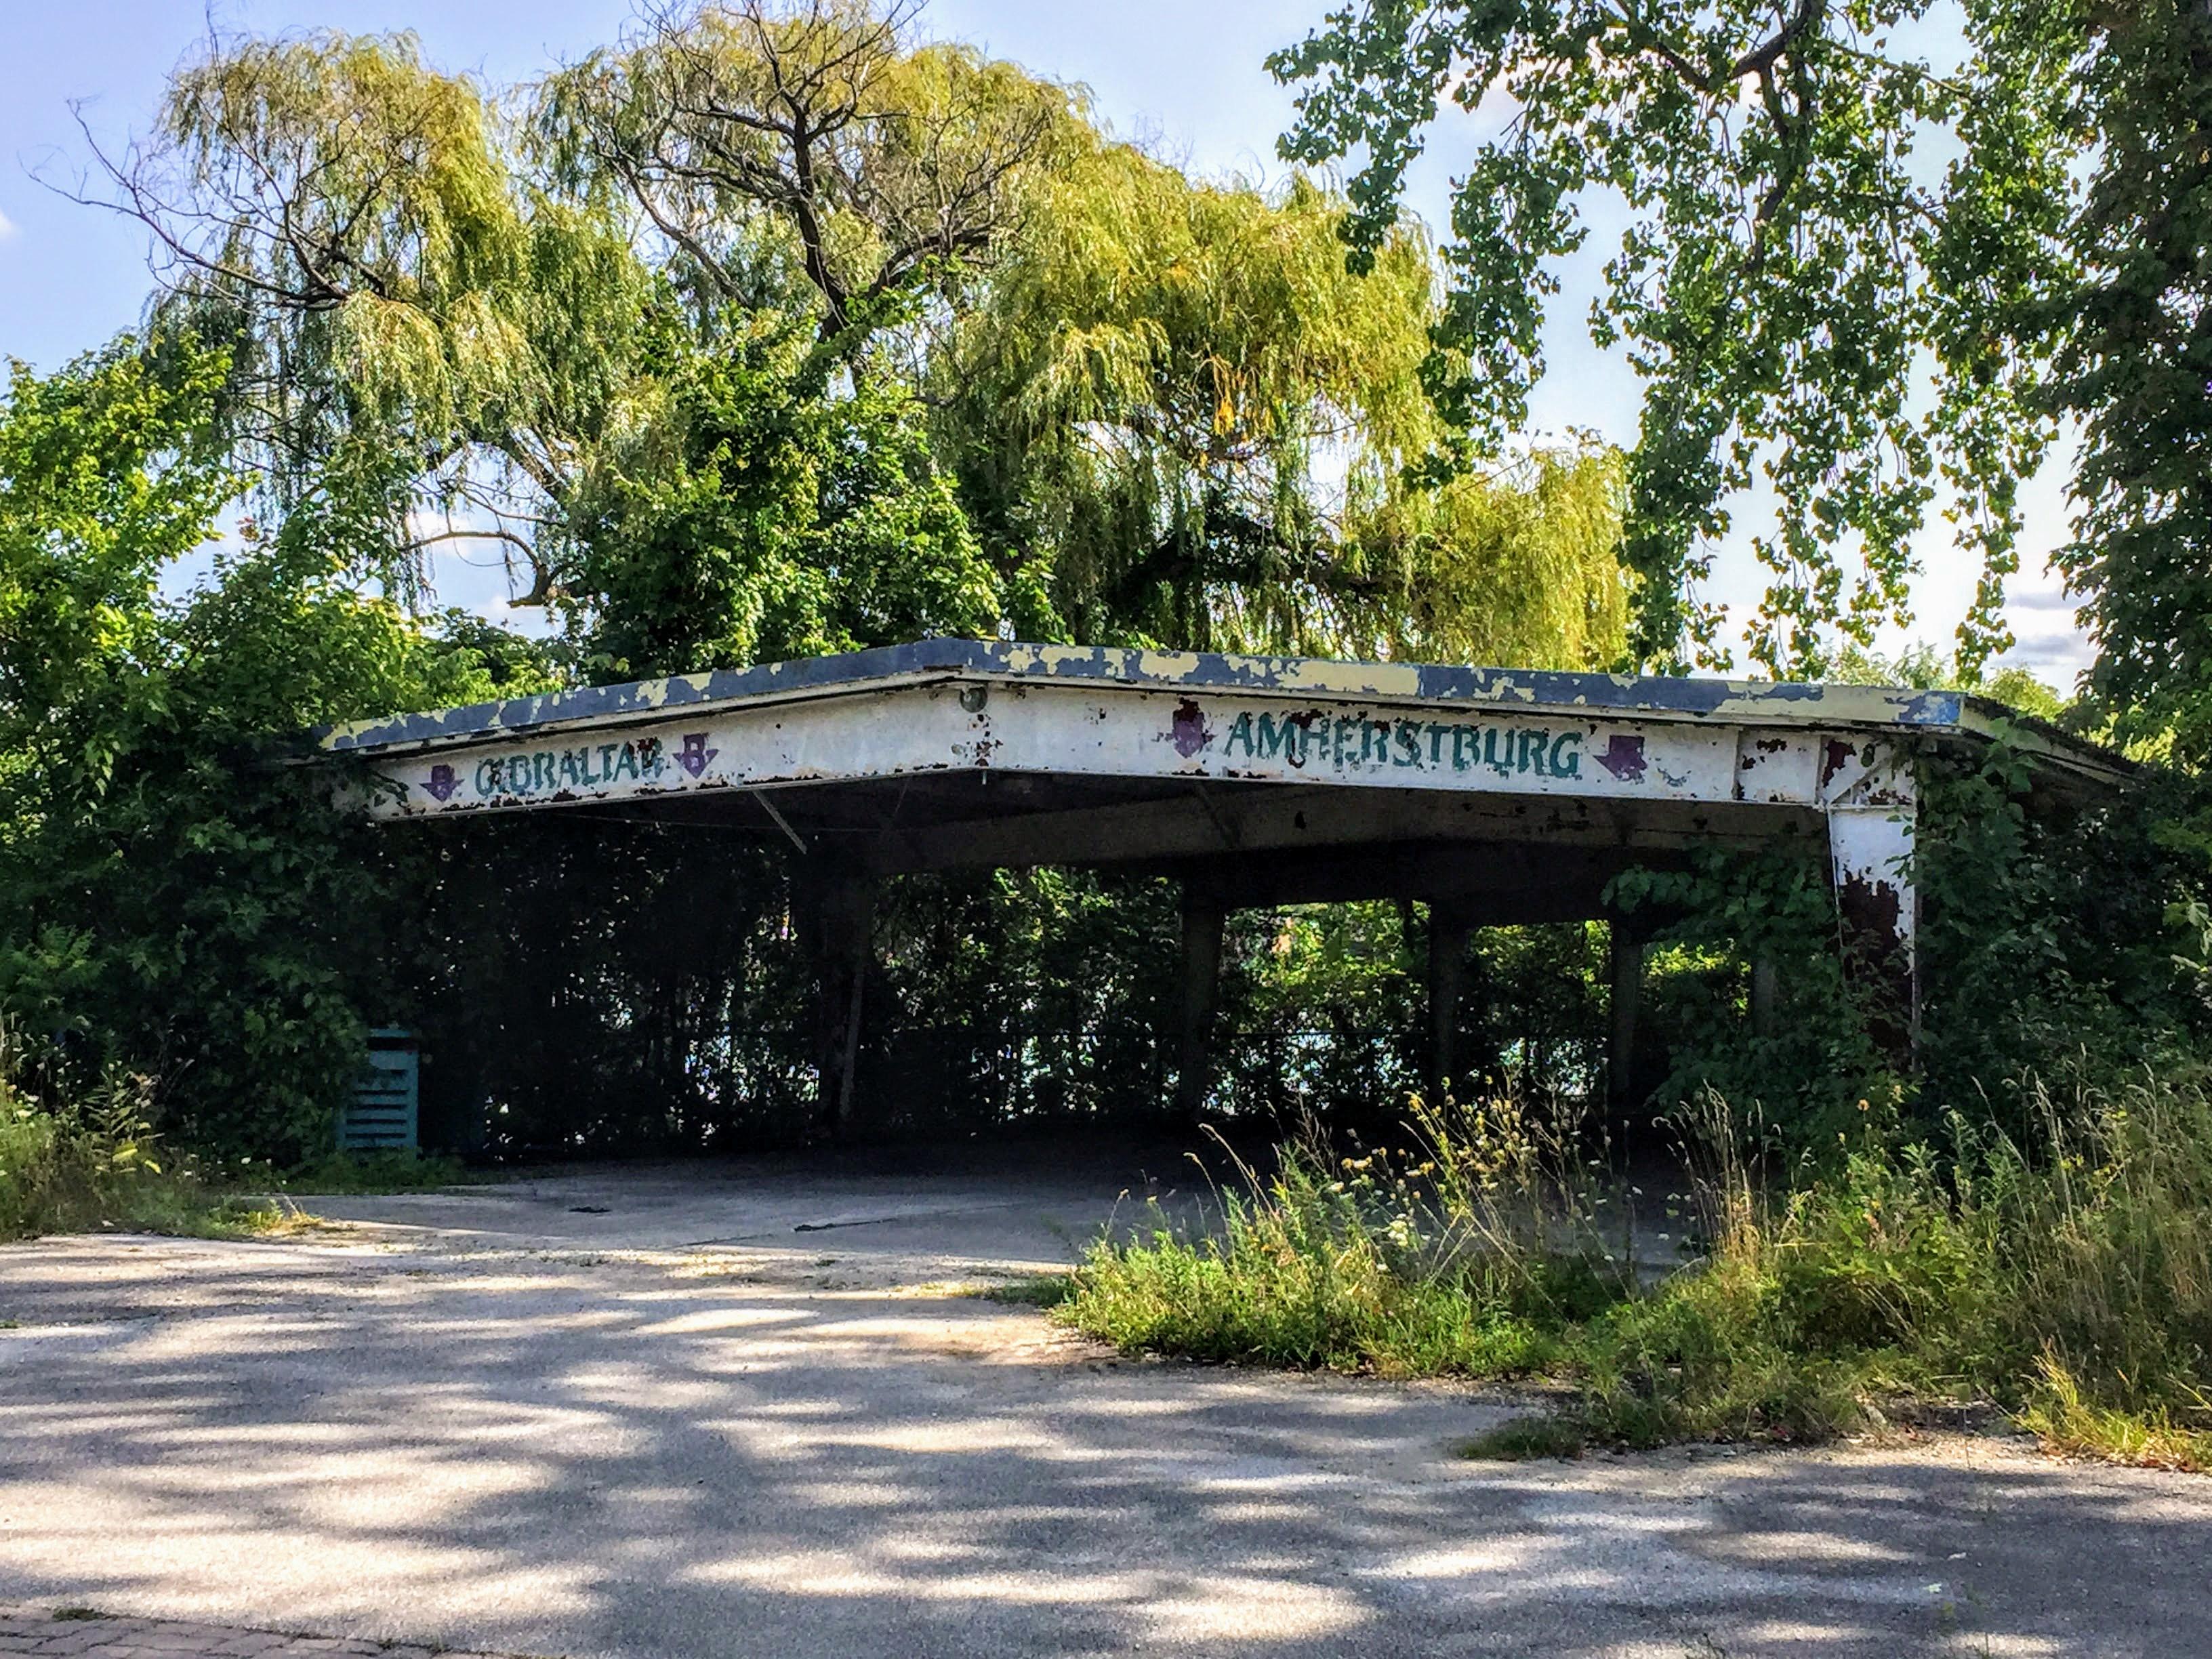 2017-08-25 Boblo - Park 08